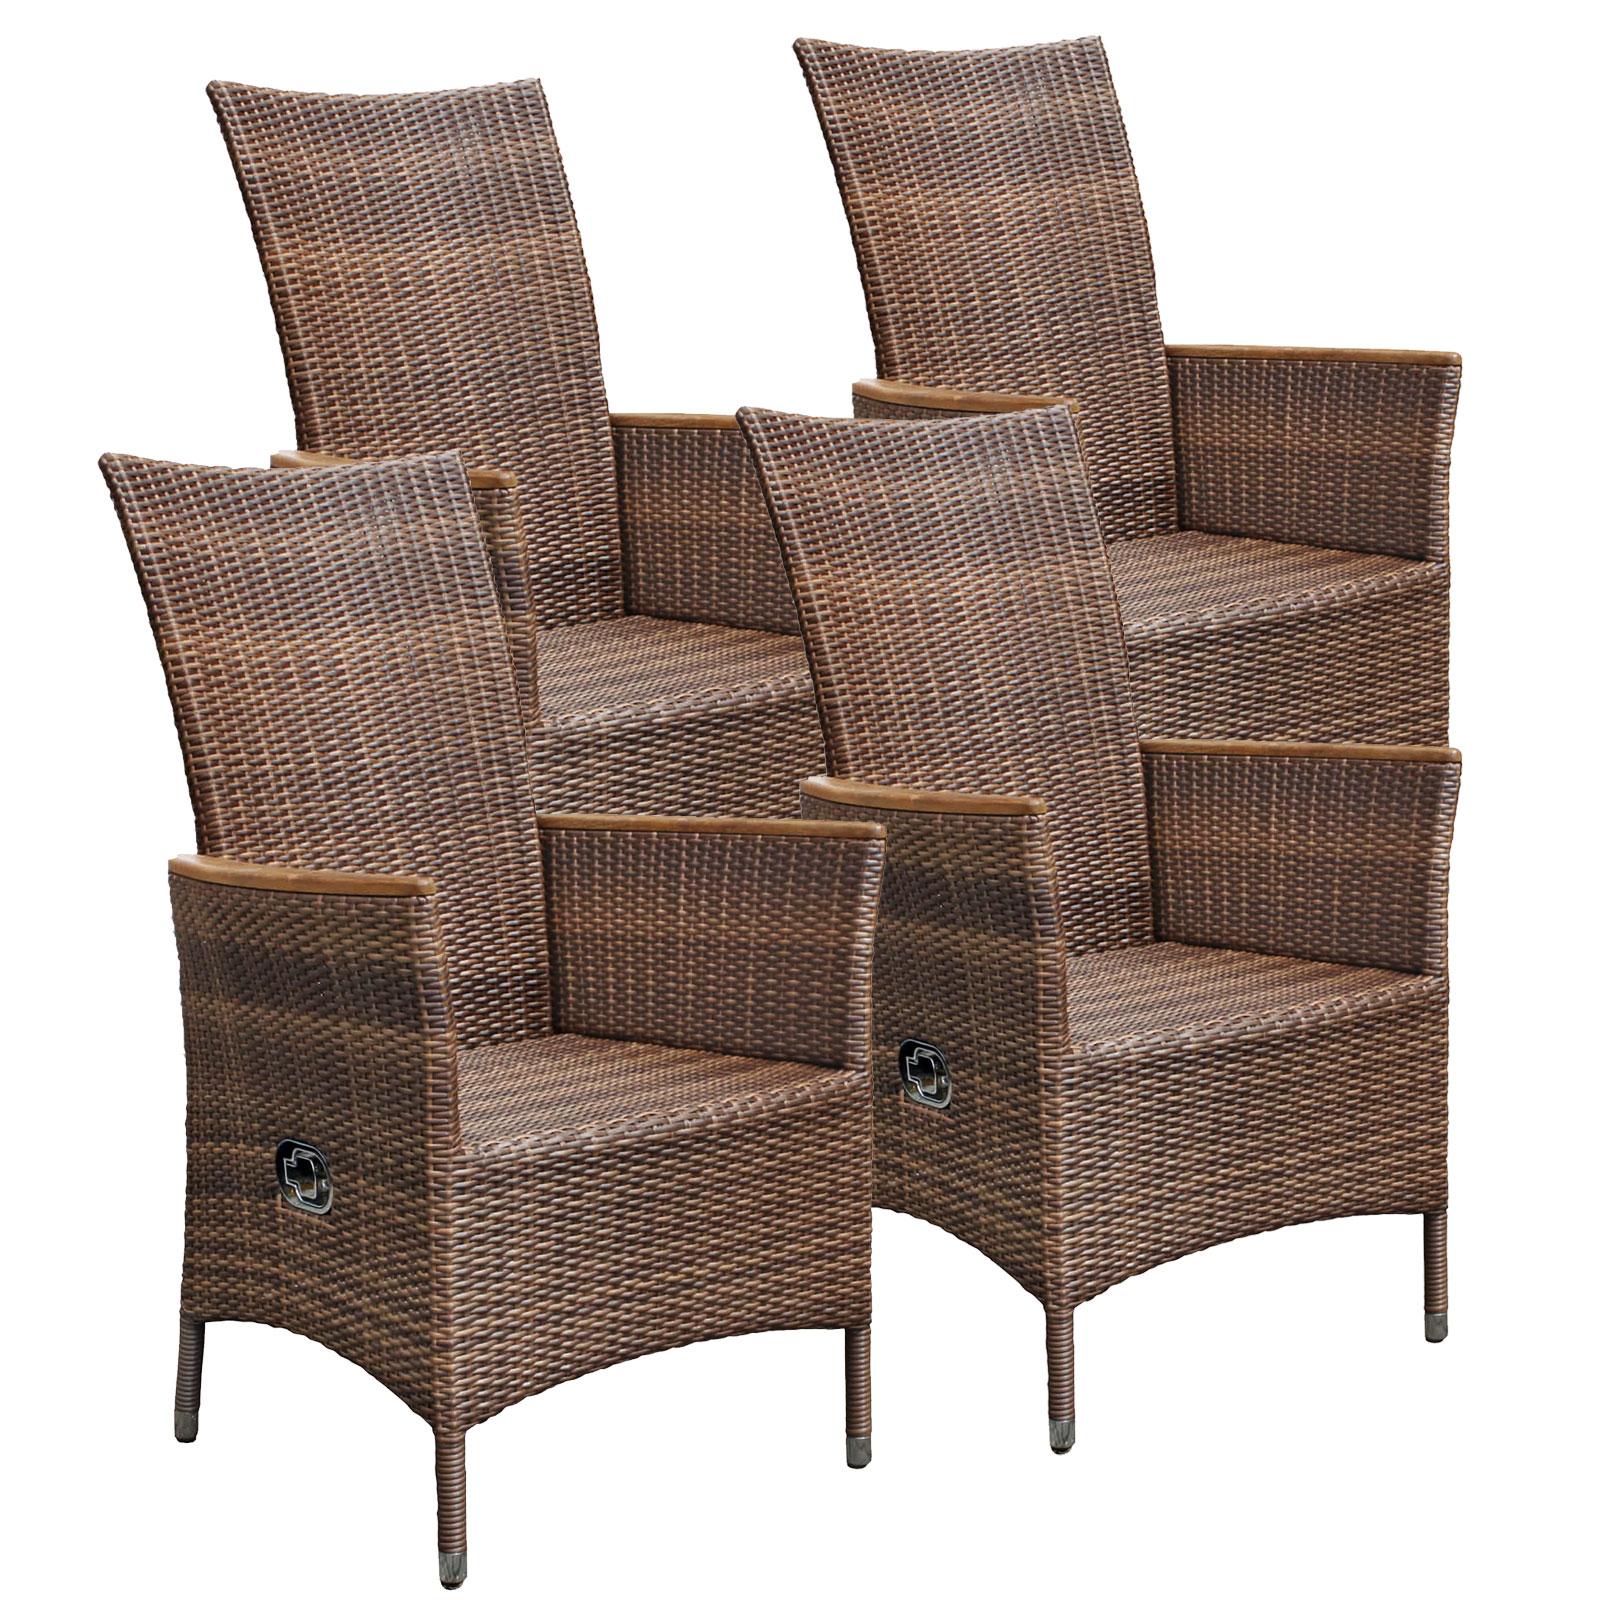 Full Size of Garten Sessel Set 4 Stck Relasessel Sthle Polyrattan Lounge Möbel Beistelltisch Versicherung Mastleuchten Bewässerung Relaxsessel Trennwand Spielgeräte Und Garten Garten Relaxsessel